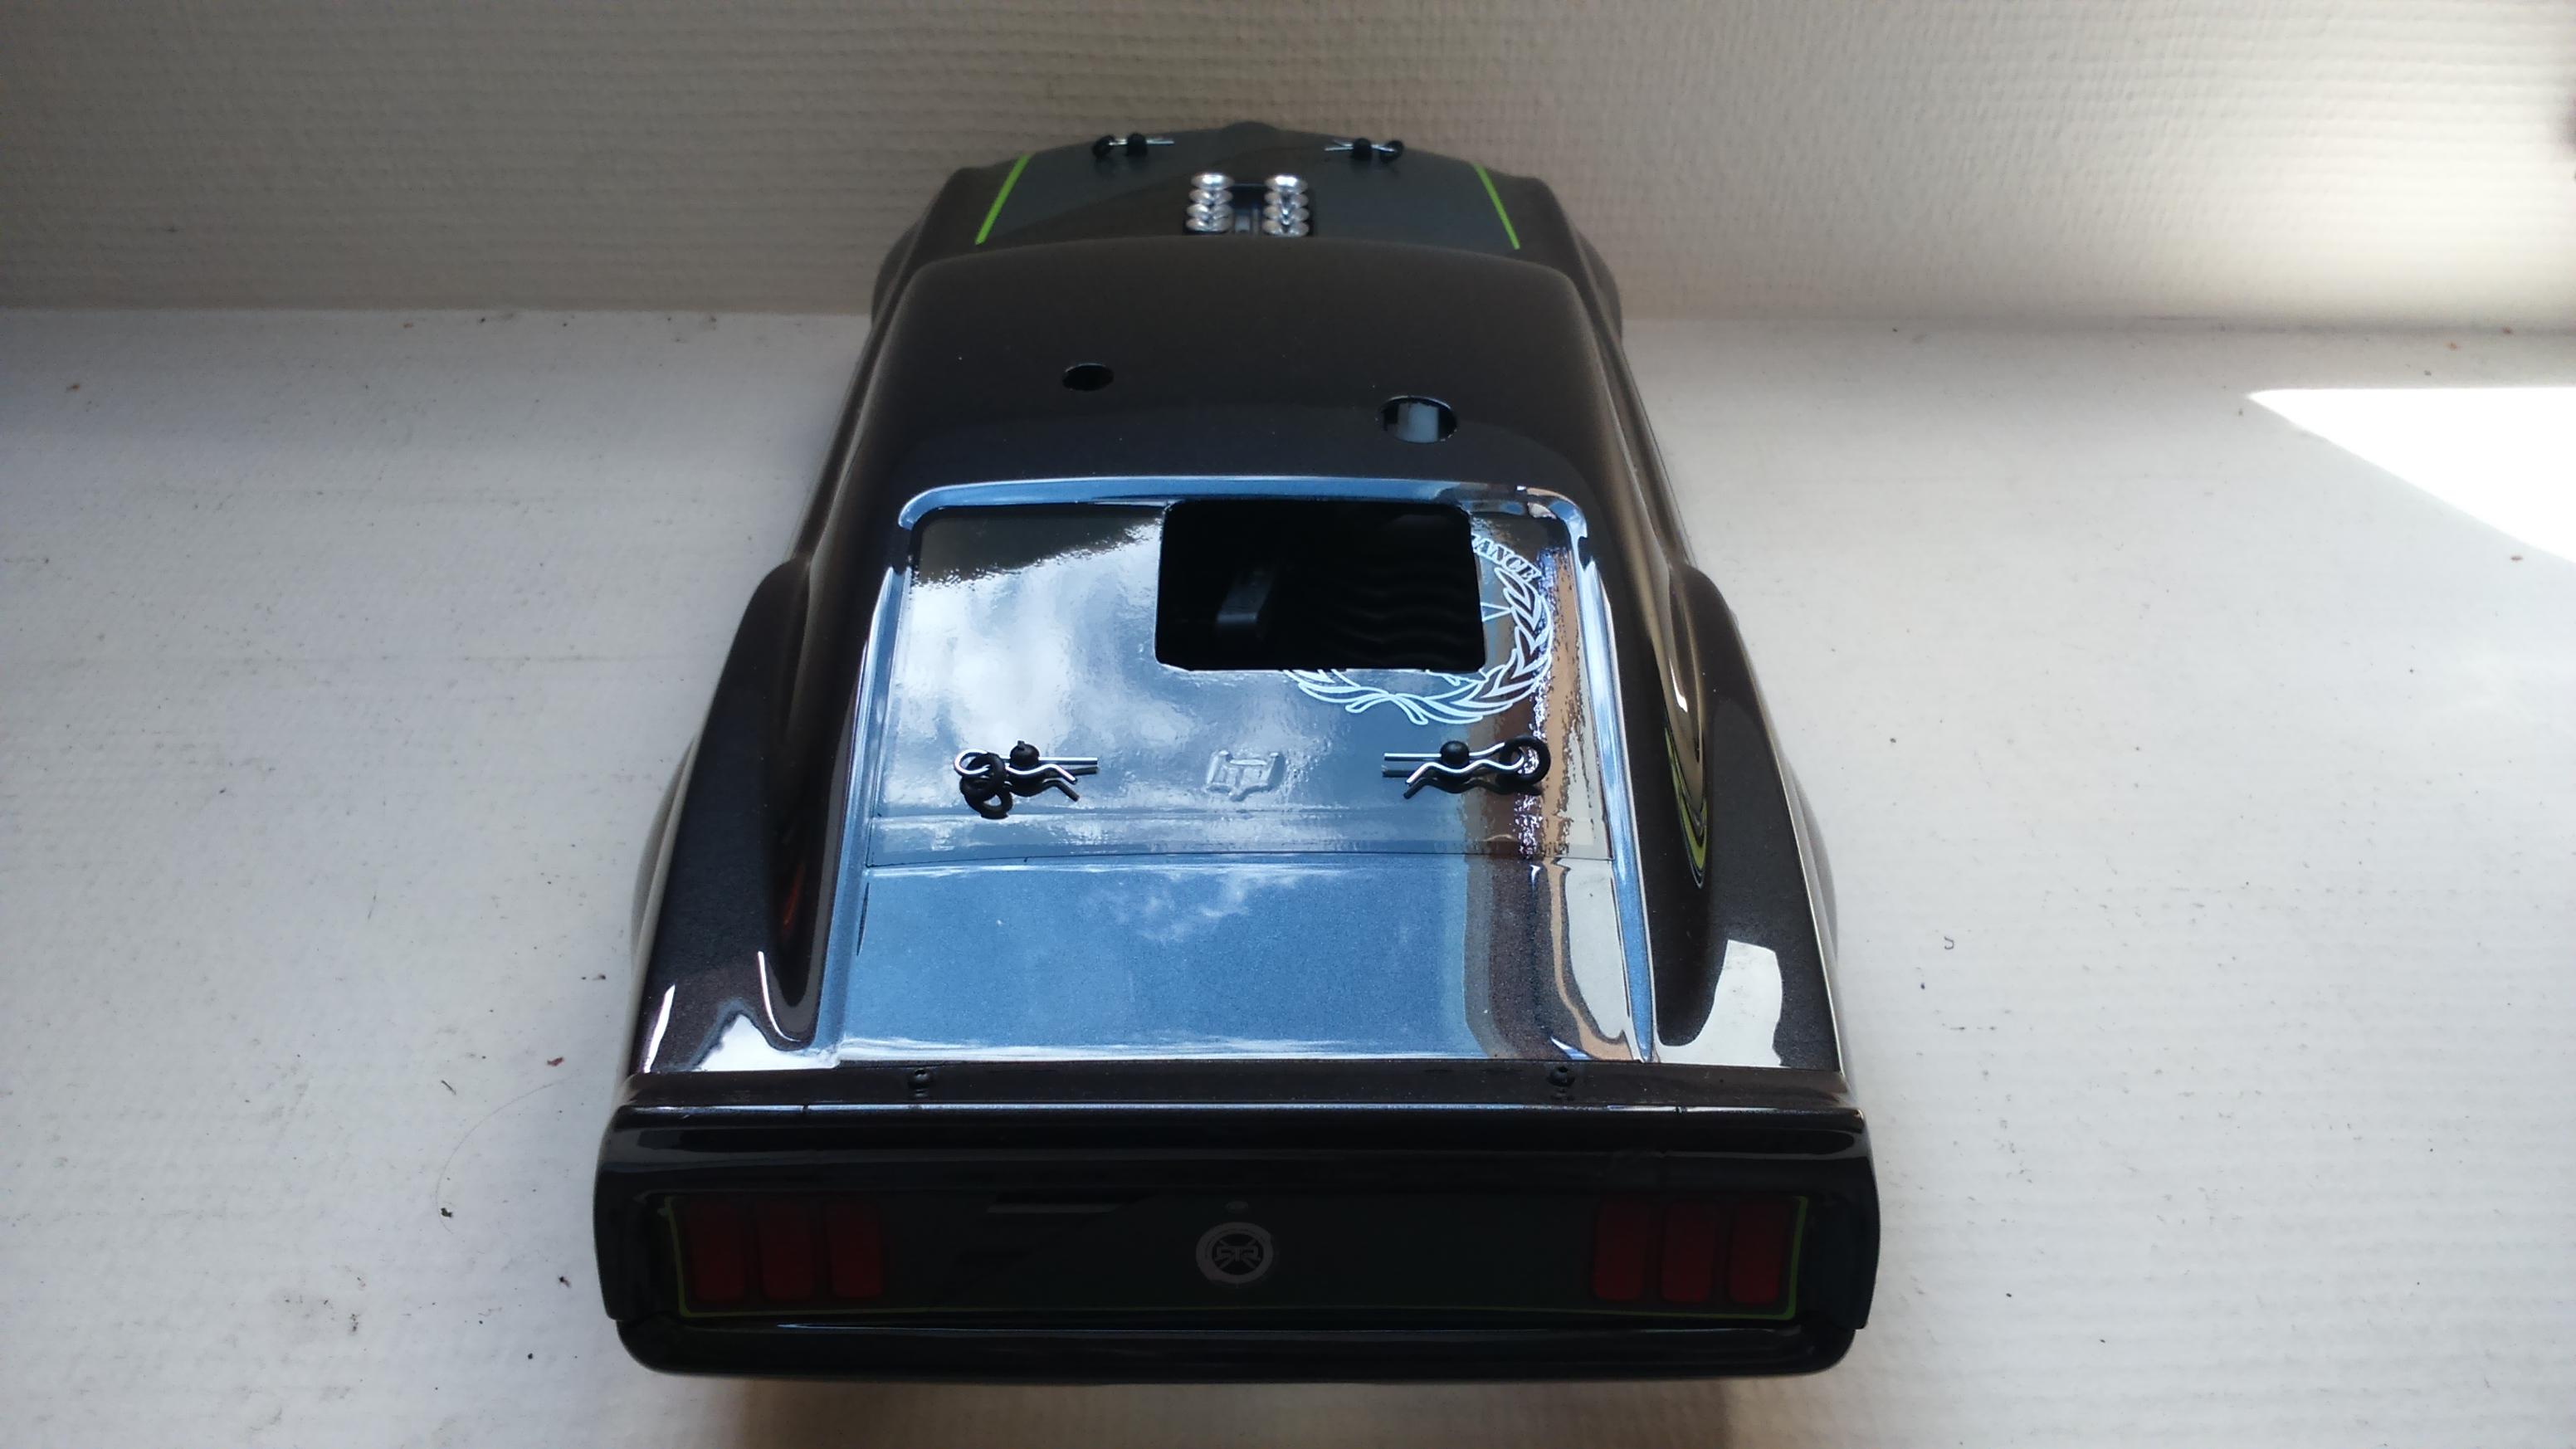 [KingLyche] Ma Nitro RS4 3 EVO+ Mustang 1969 150619042426637067